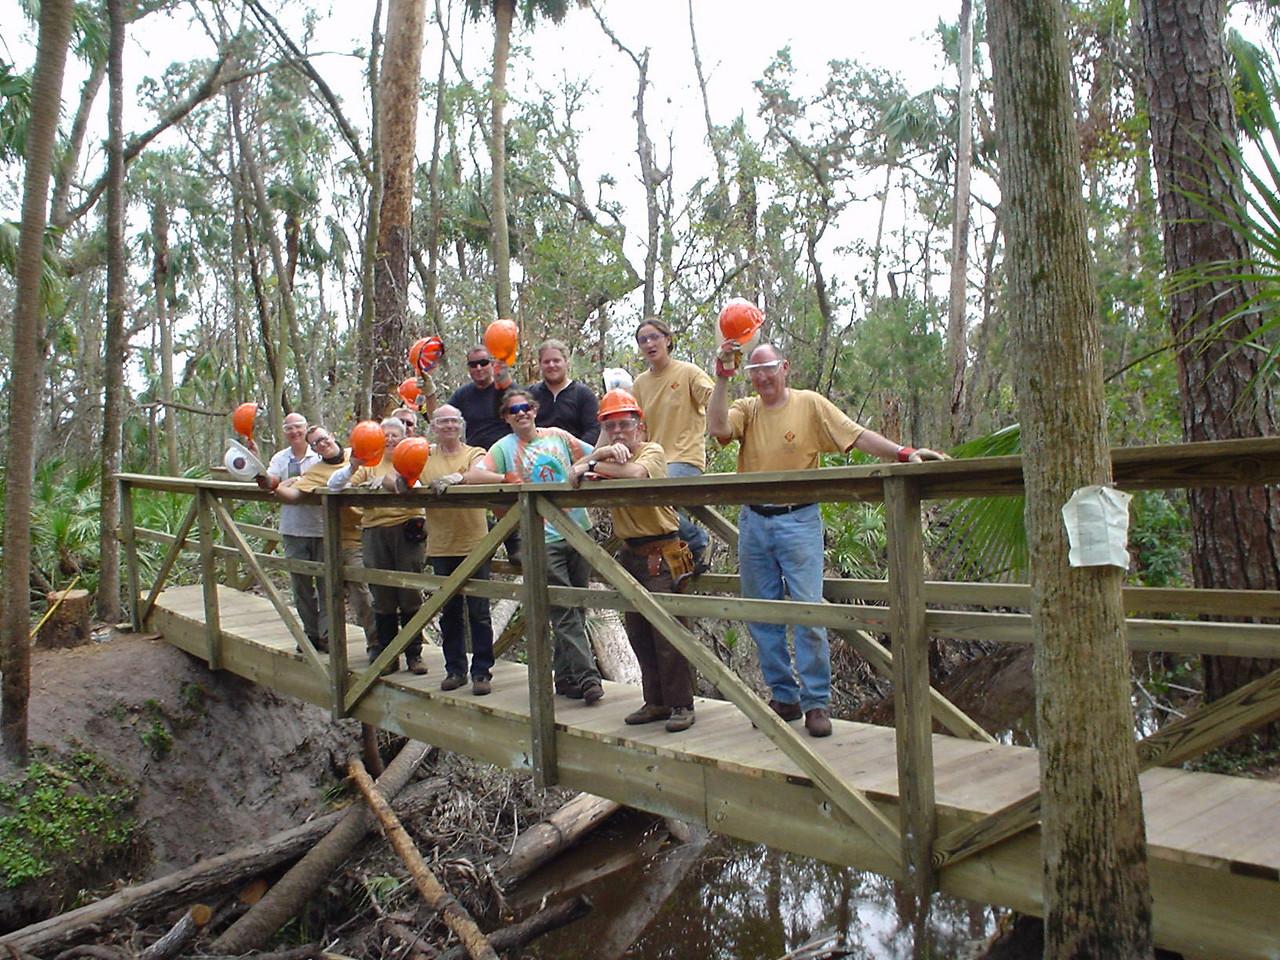 Crew on the long bridge<br /> Photo credit: FTA / Bob Woods